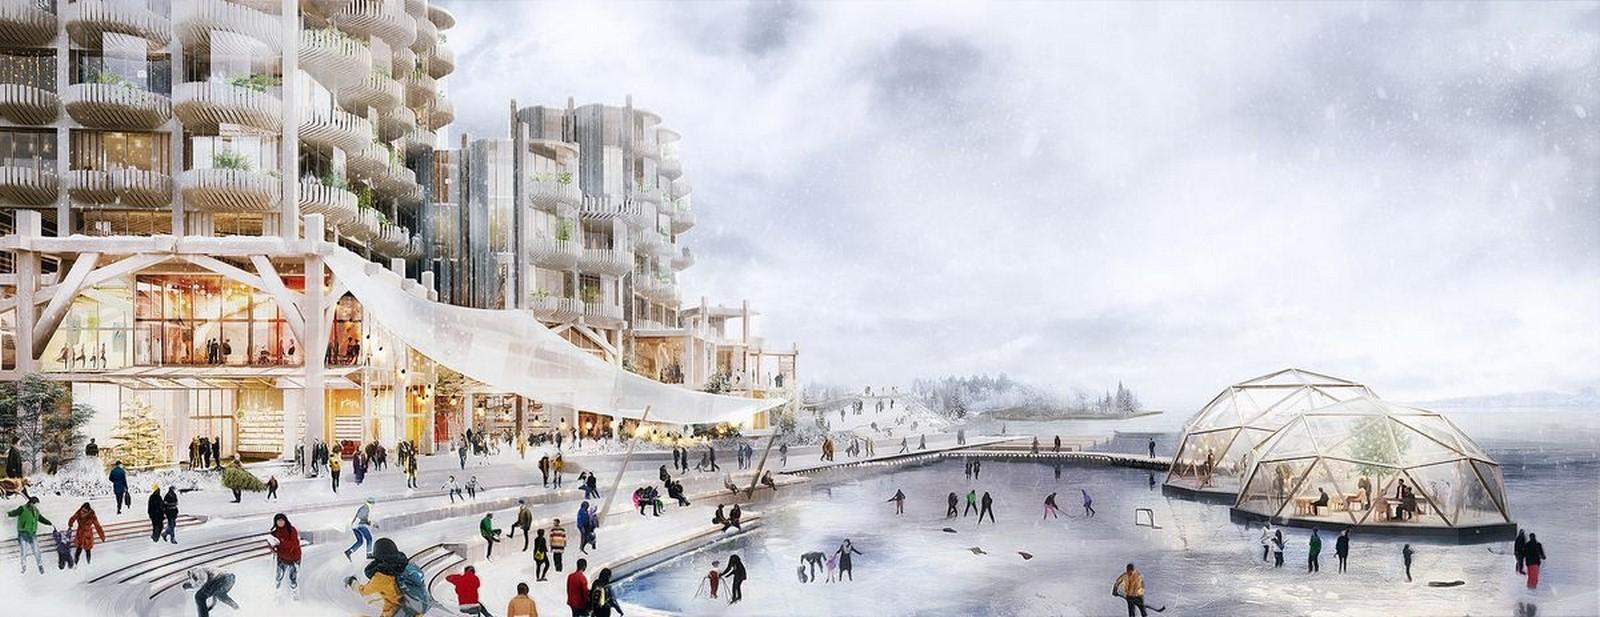 Alphabet's Sidewalk Labs by Snøhetta and Thomas Heatherwick: Mass-timber city - Sheet10